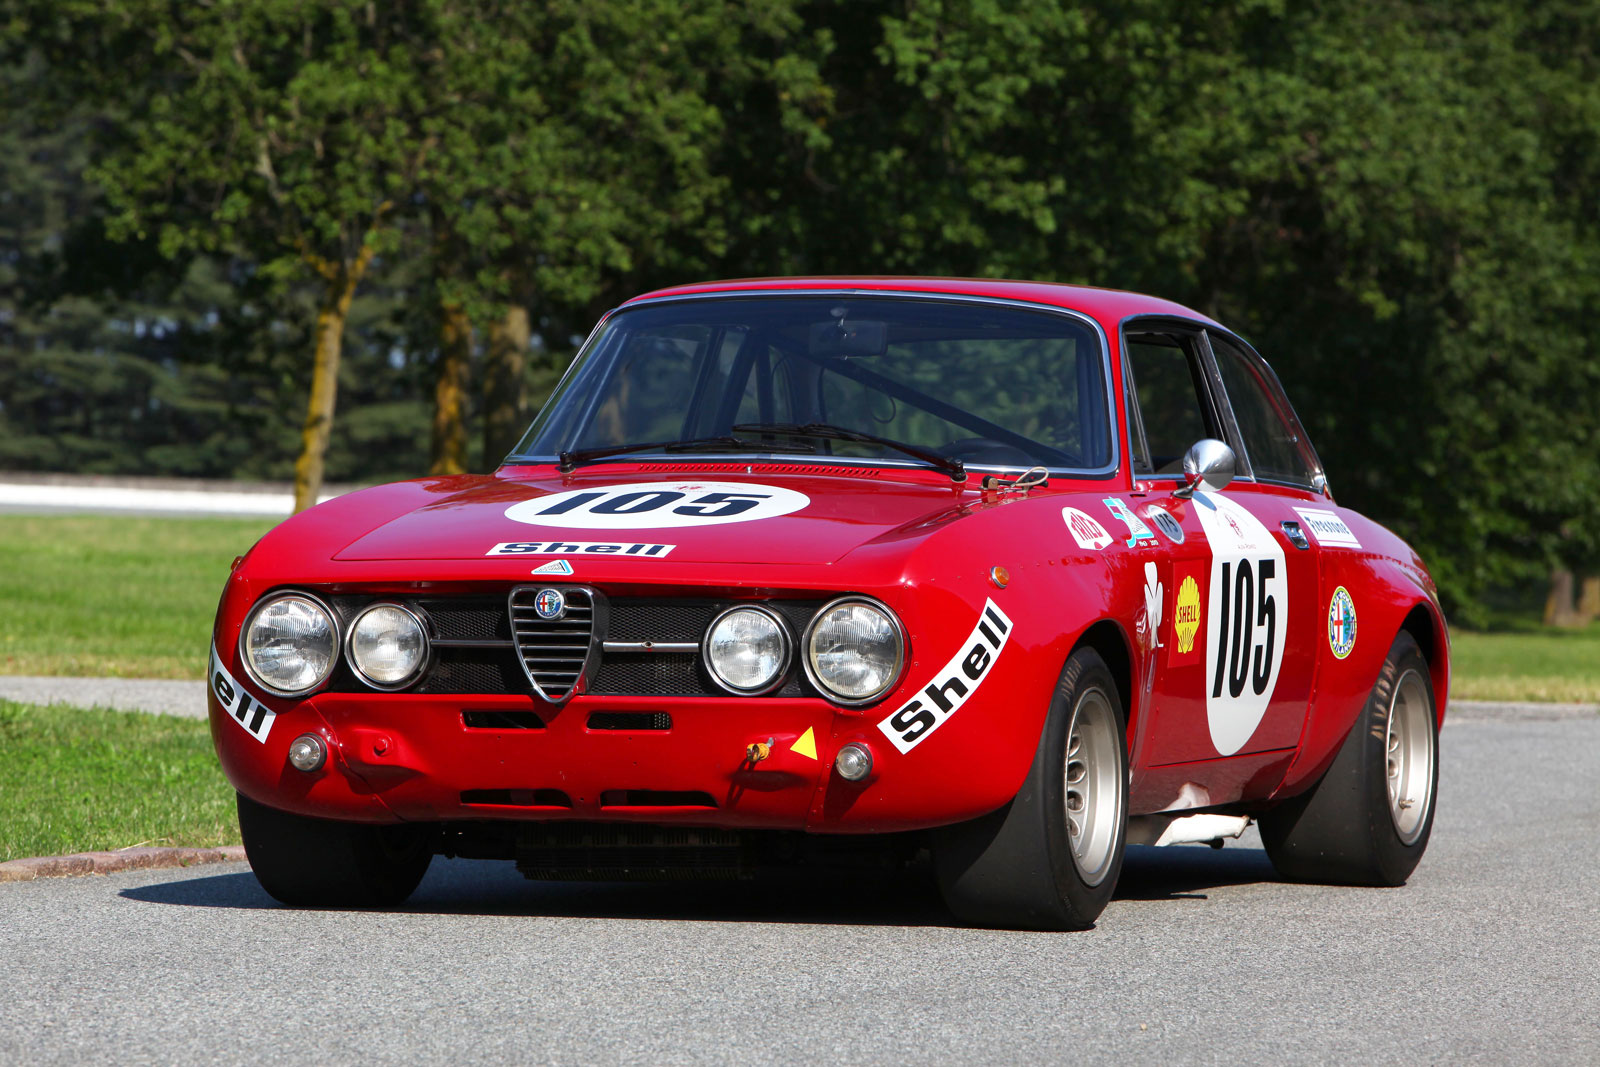 Alfa romeo spider 2000 veloce review 14